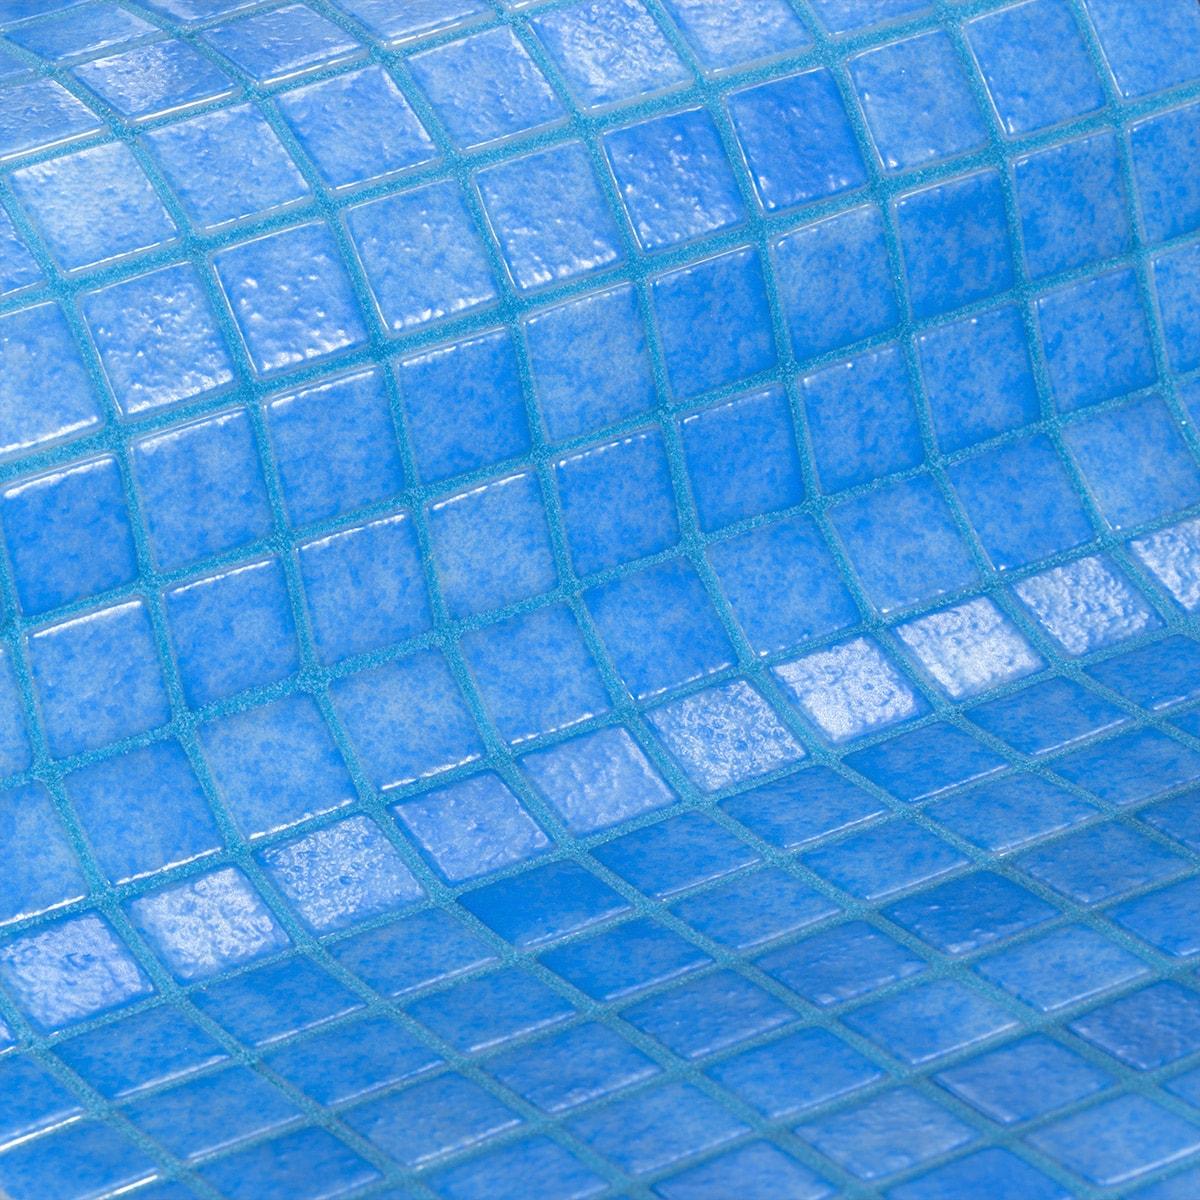 2505-A-Safe-Safe-steps-Mosaic-Ezarri.jpg